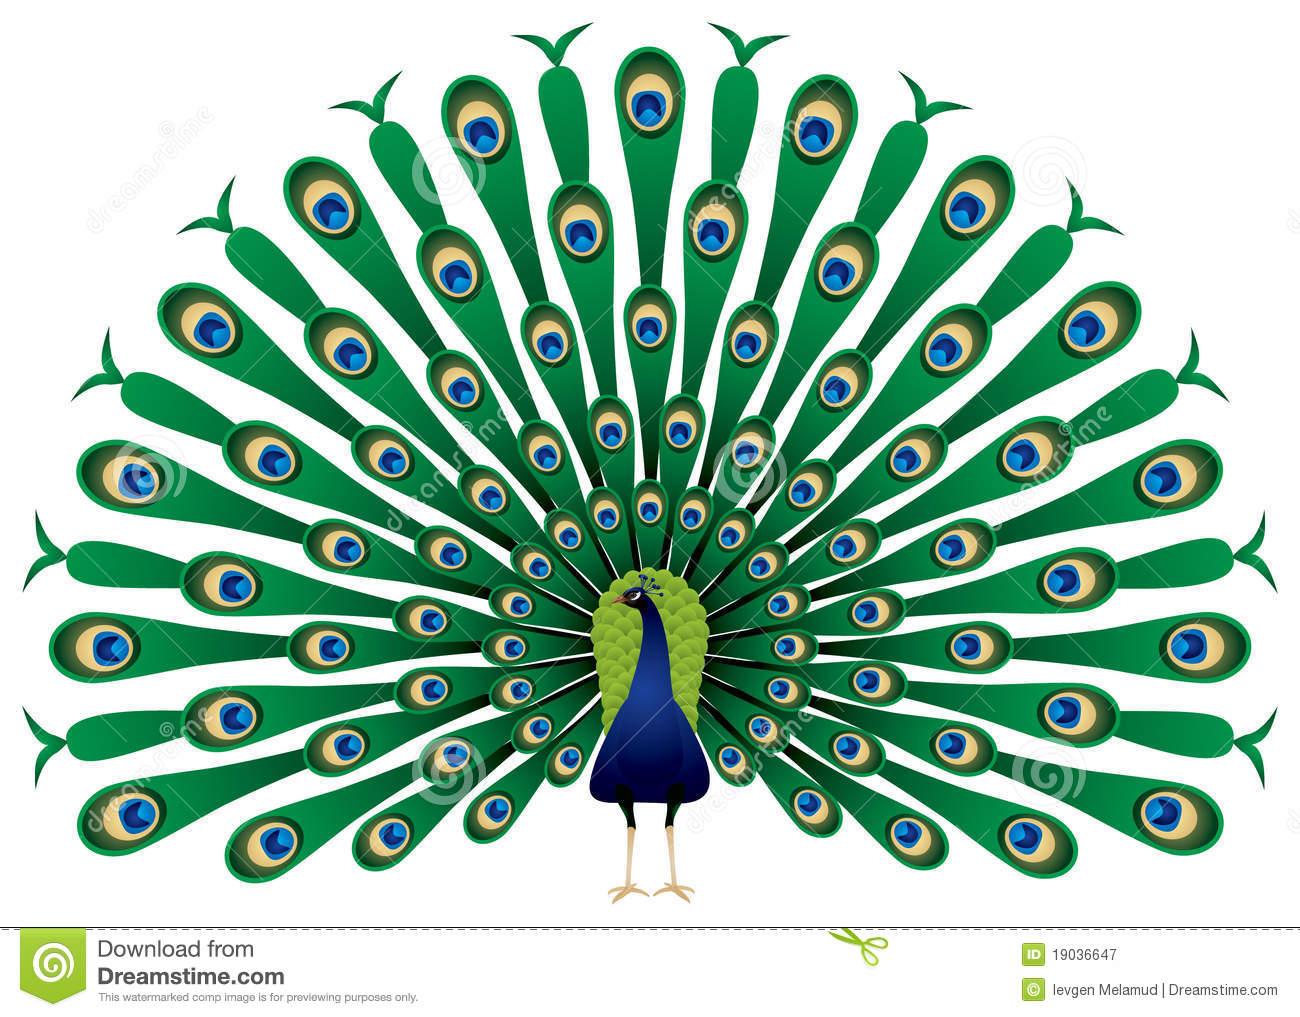 Peacock Clipart; Peacock .-Peacock Clipart; Peacock .-7